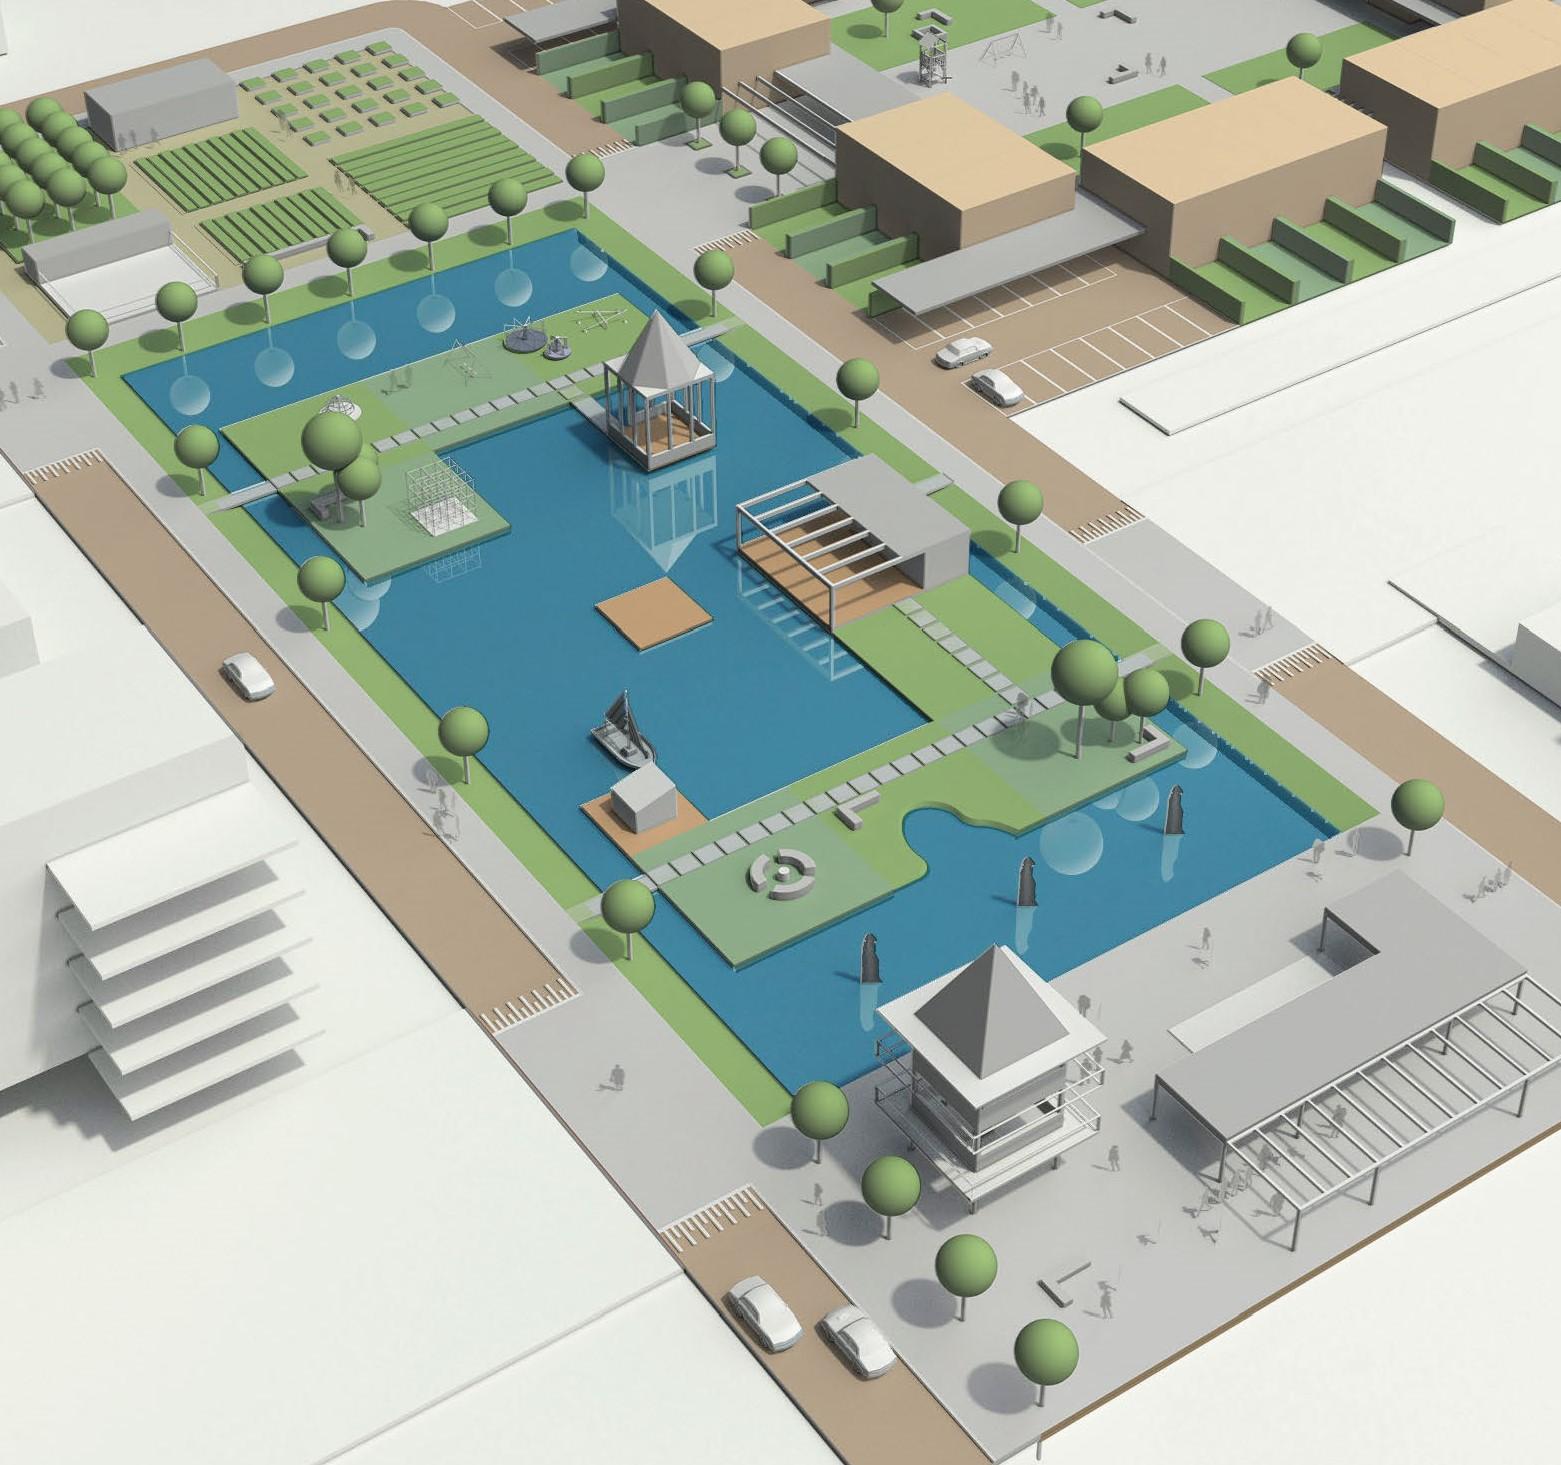 Opinie Flip Krabbendam - Boom en Bewoners